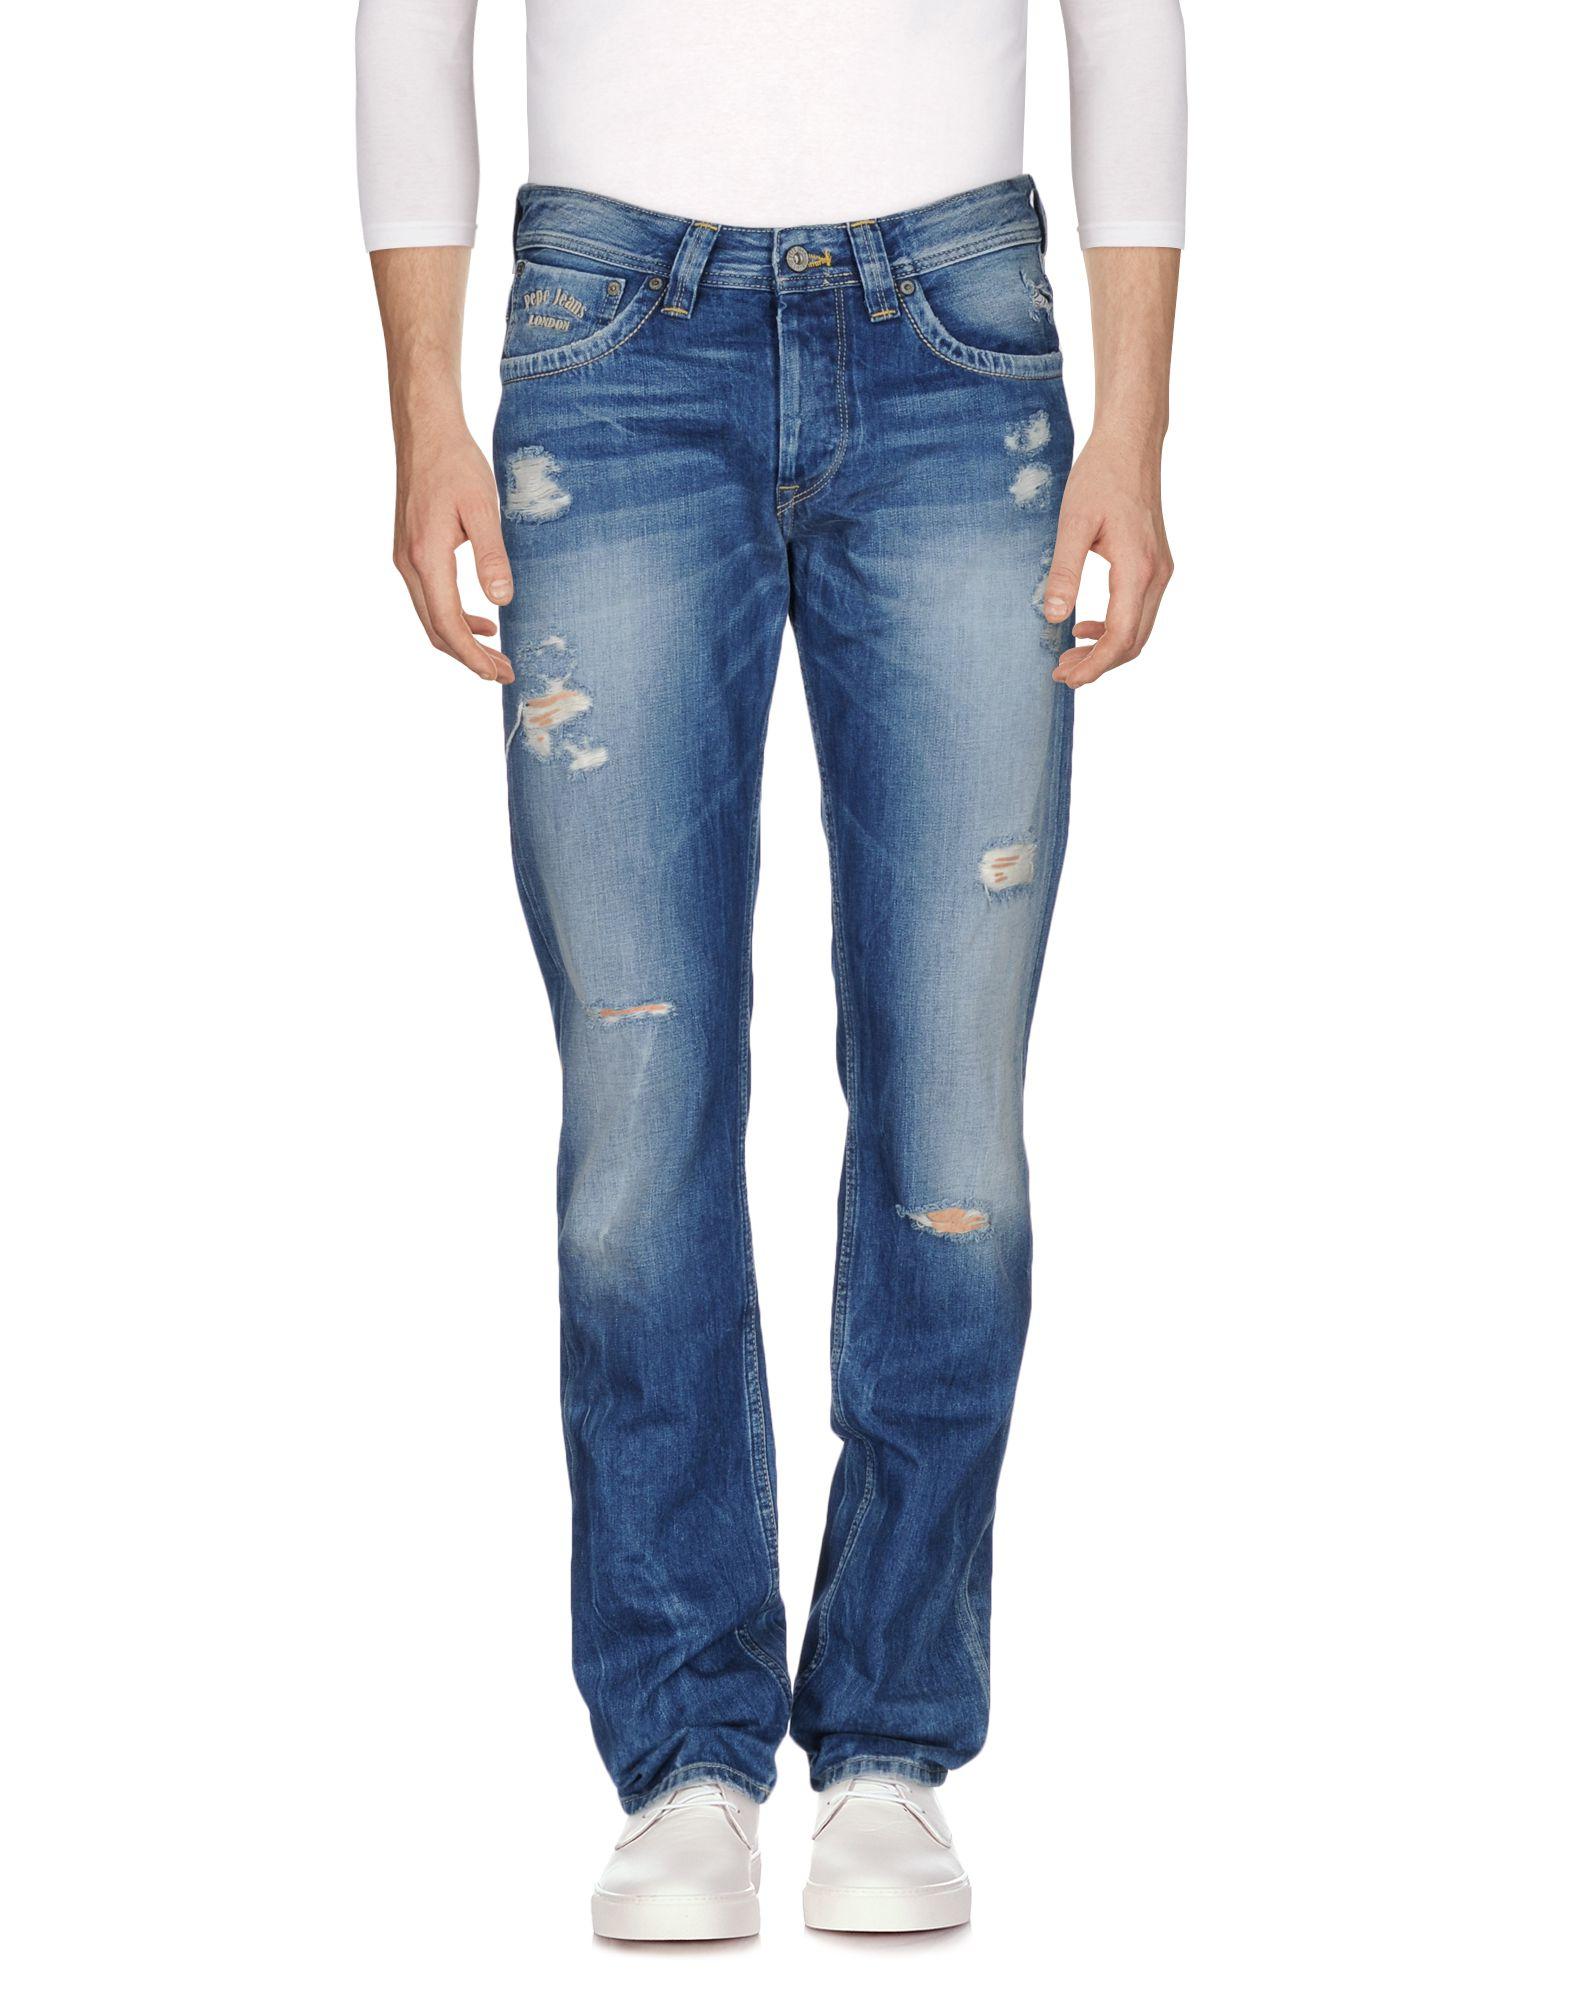 ФОТО pepe jeans джинсовые брюки